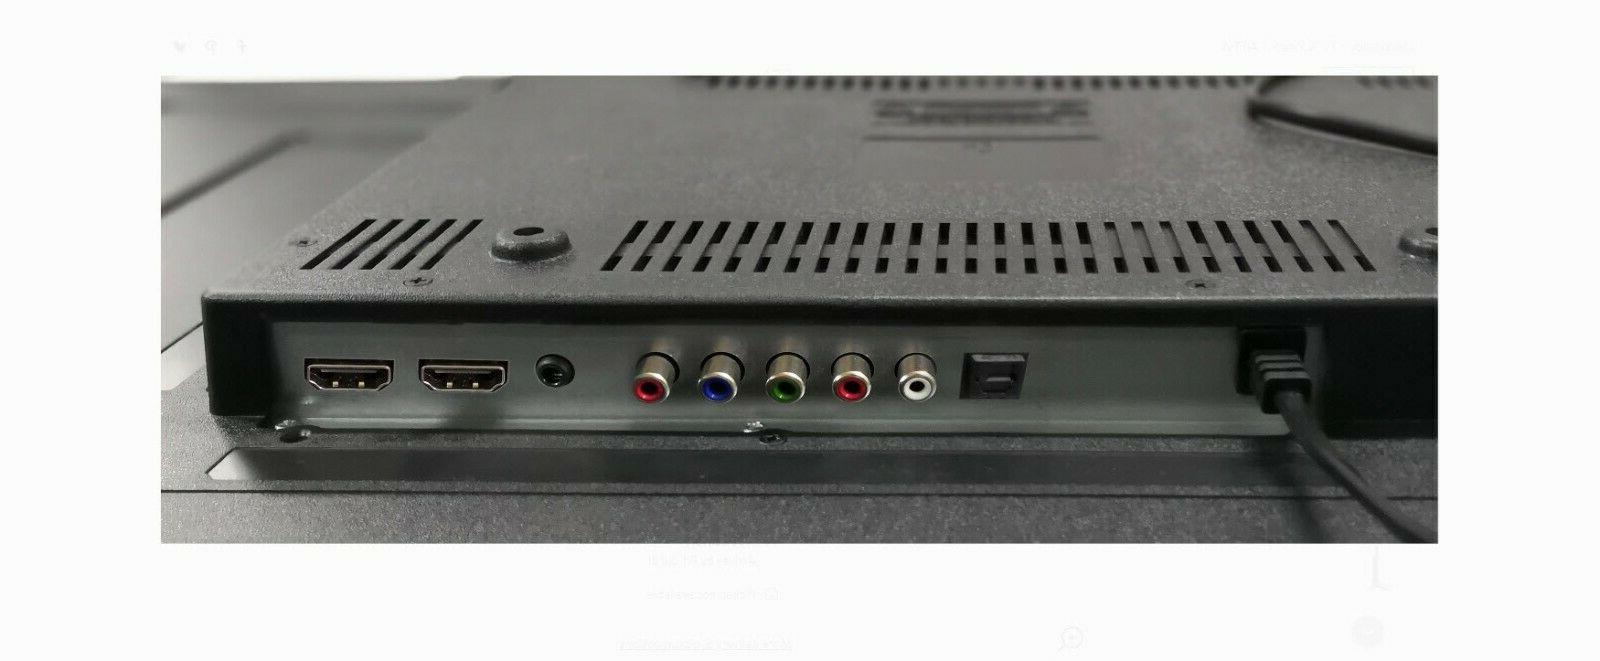 🔥 NEW Class 4K HD Smart LED 3 HDMI UHD